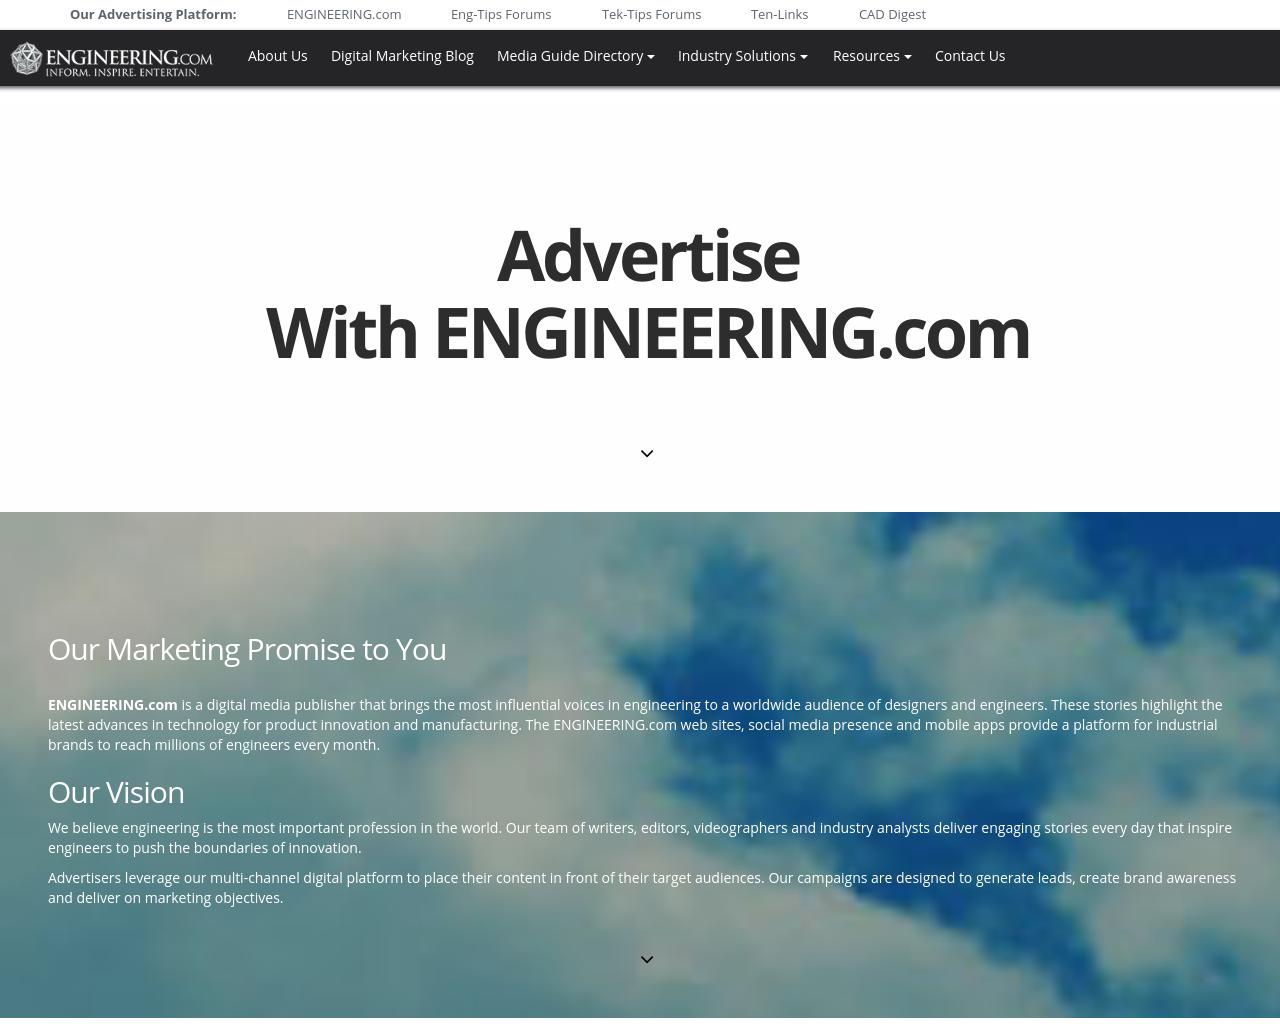 Engineering.com-Advertising-Reviews-Pricing